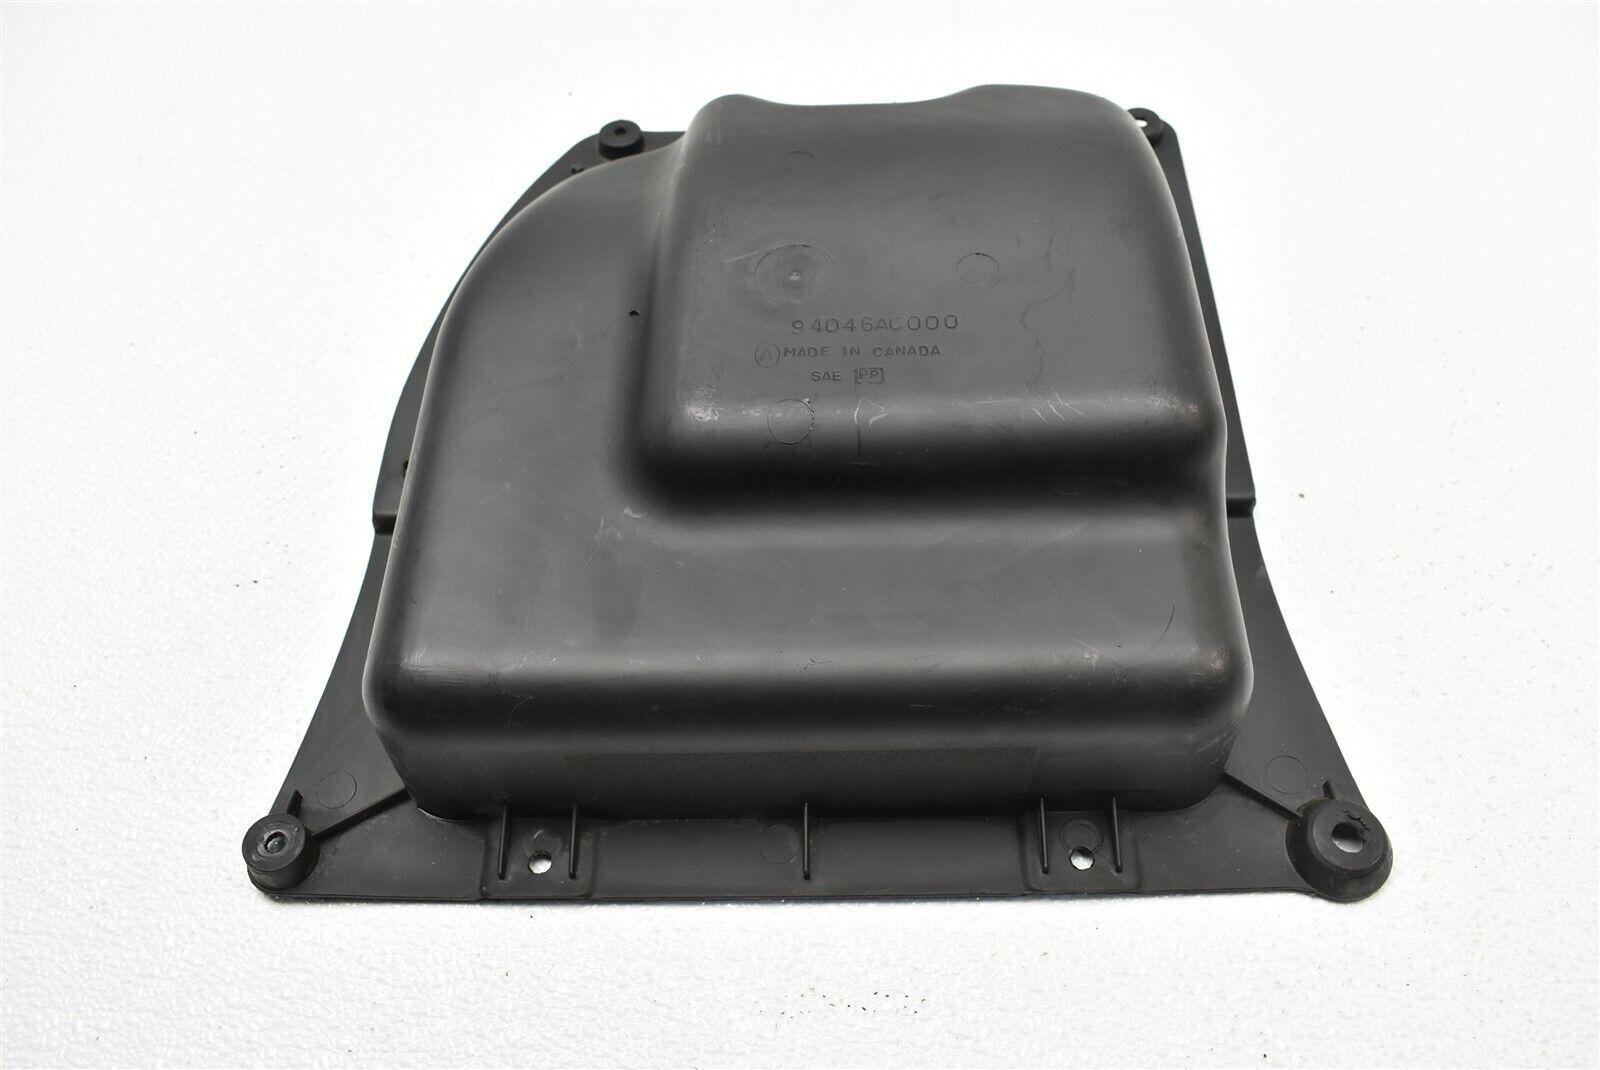 2000-2004 Subaru Legacy Outback Wagon Trunk Organizer Spare Tire Cover 00-04